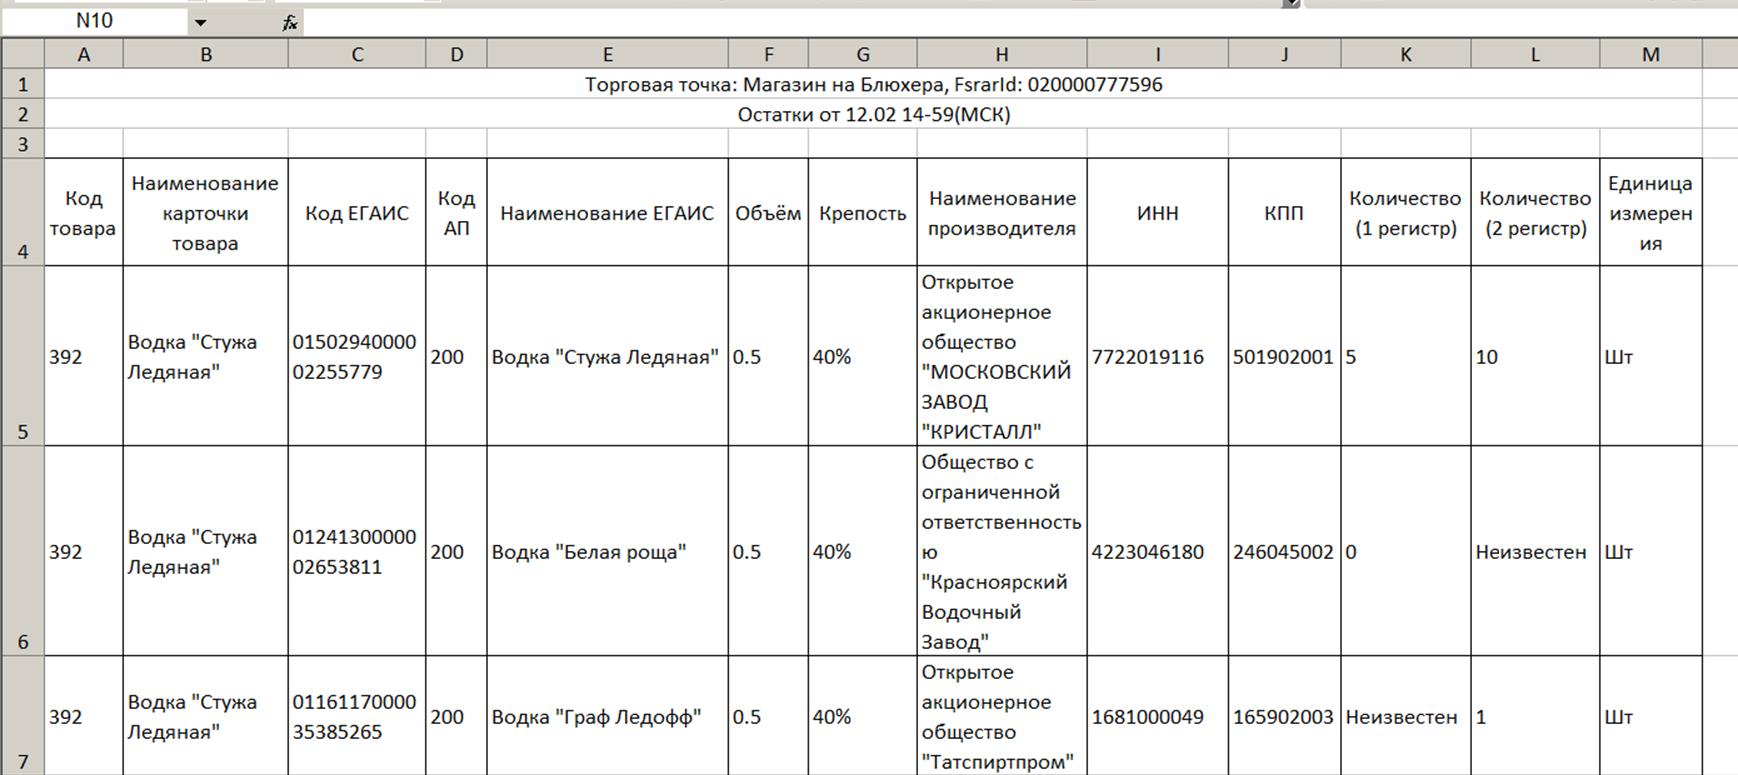 Exel-таблица с остатками